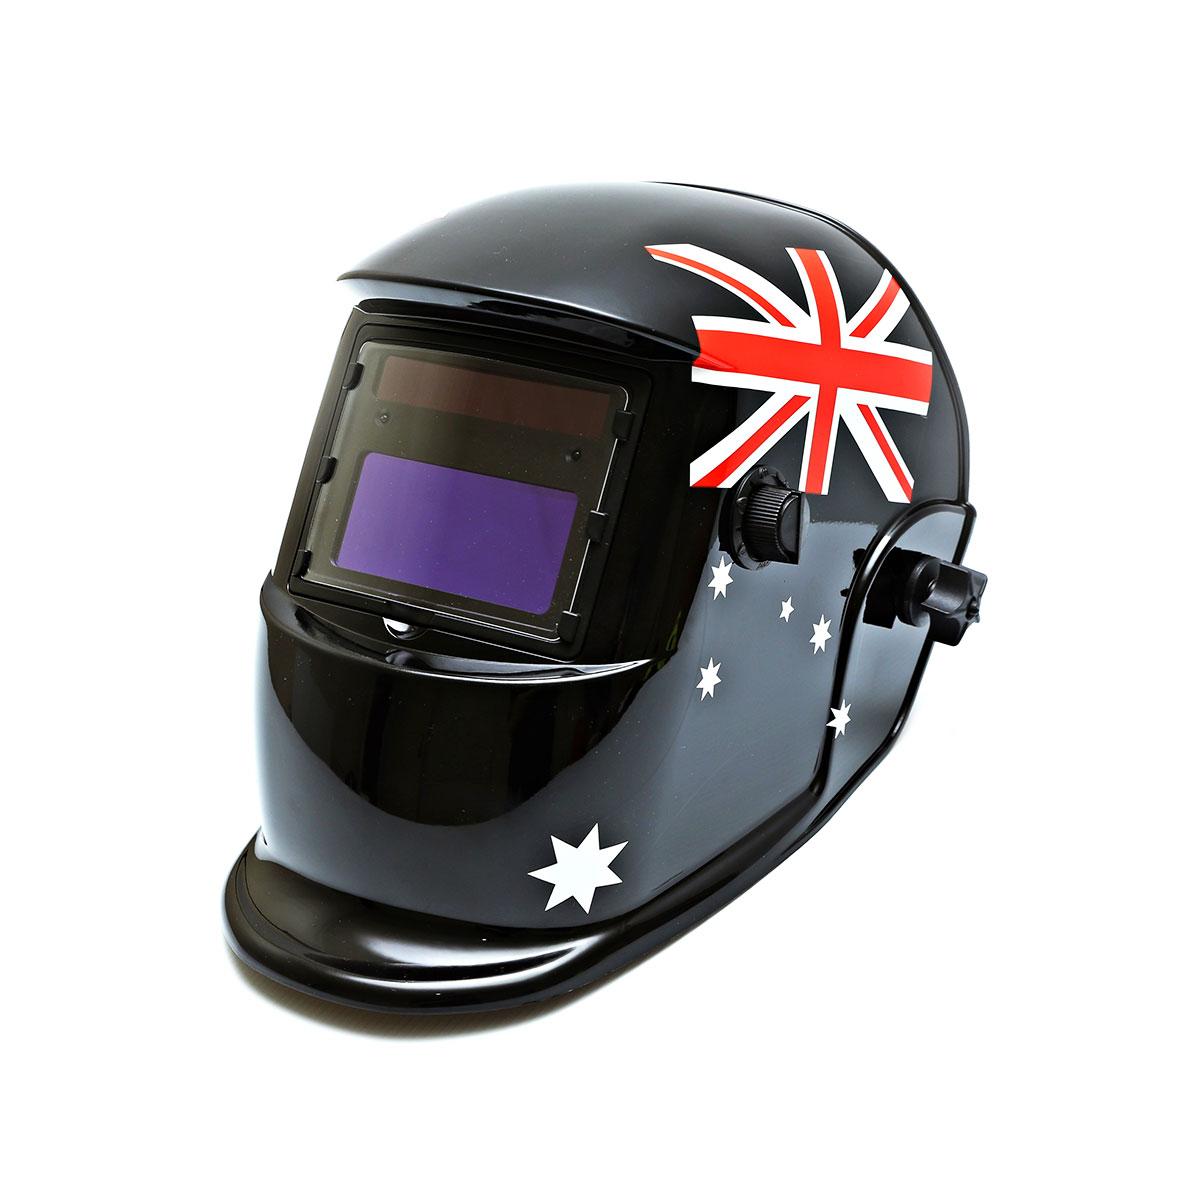 Centurion Solar Auto Darkening Welding Helmet - Australian Flag